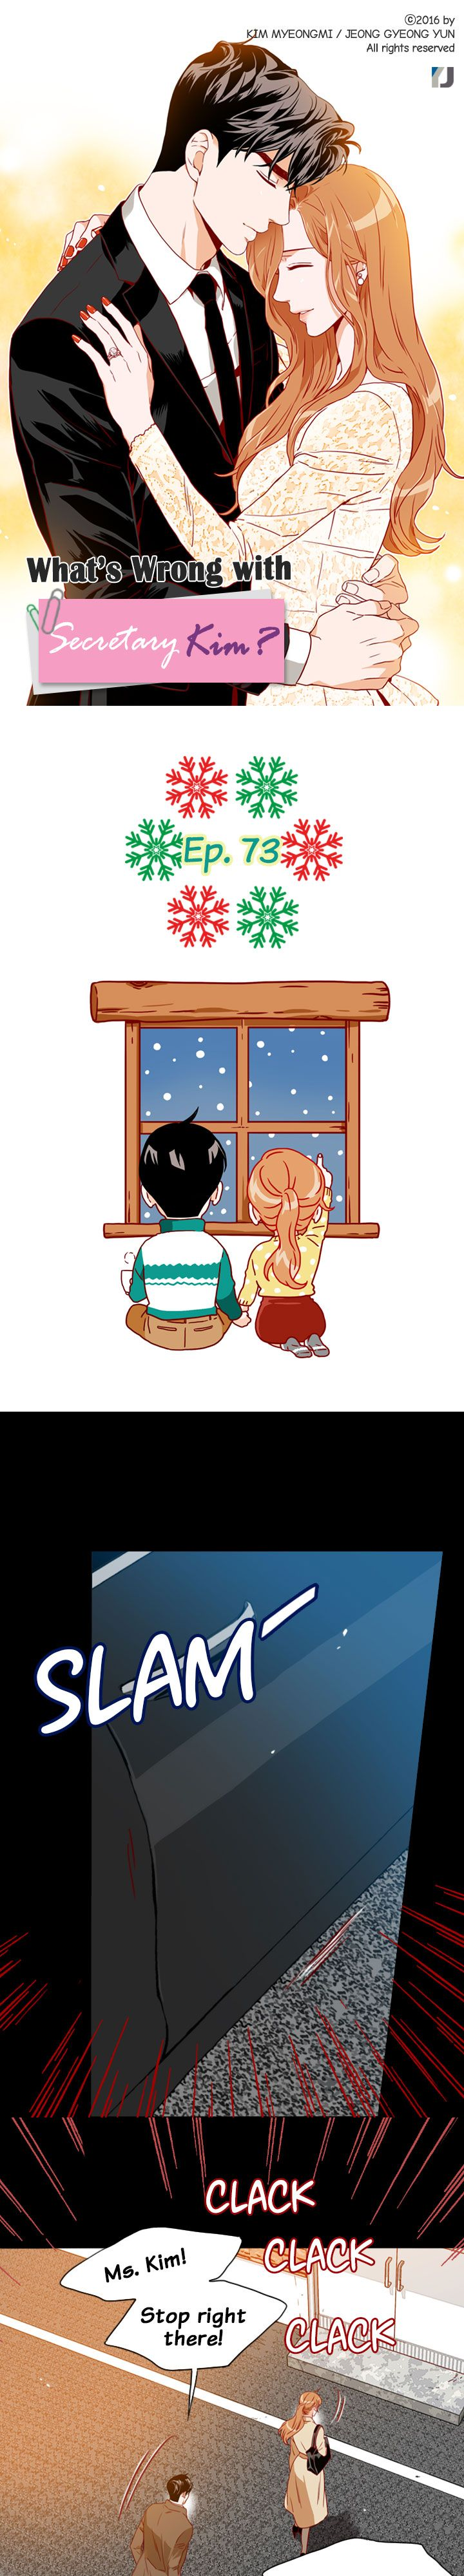 https://manga.mangadogs.com/comics/pic2/15/25807/960730/d5adfcff9611d3f00885d6b36b8d4491.jpg Page 1